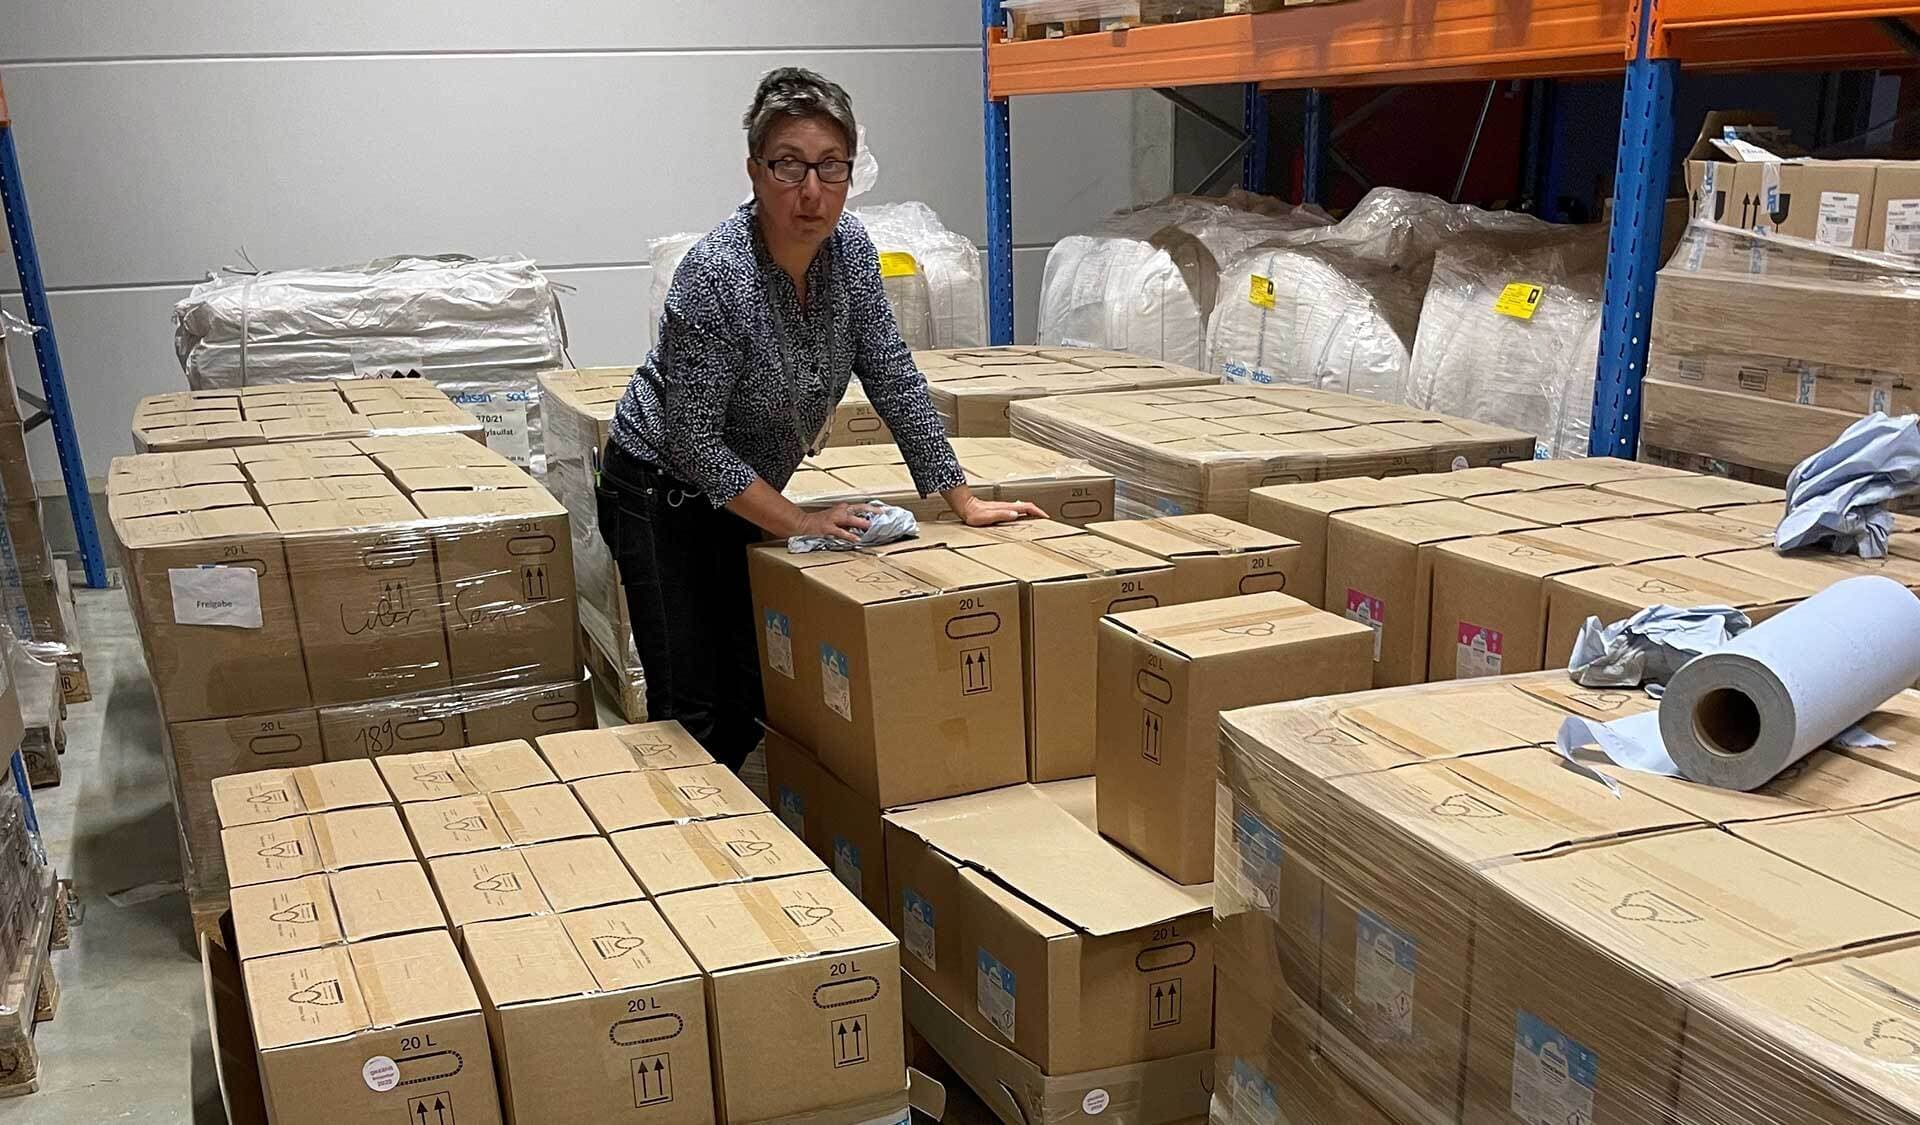 Anja Voß prüft Waschmittel-Kartons